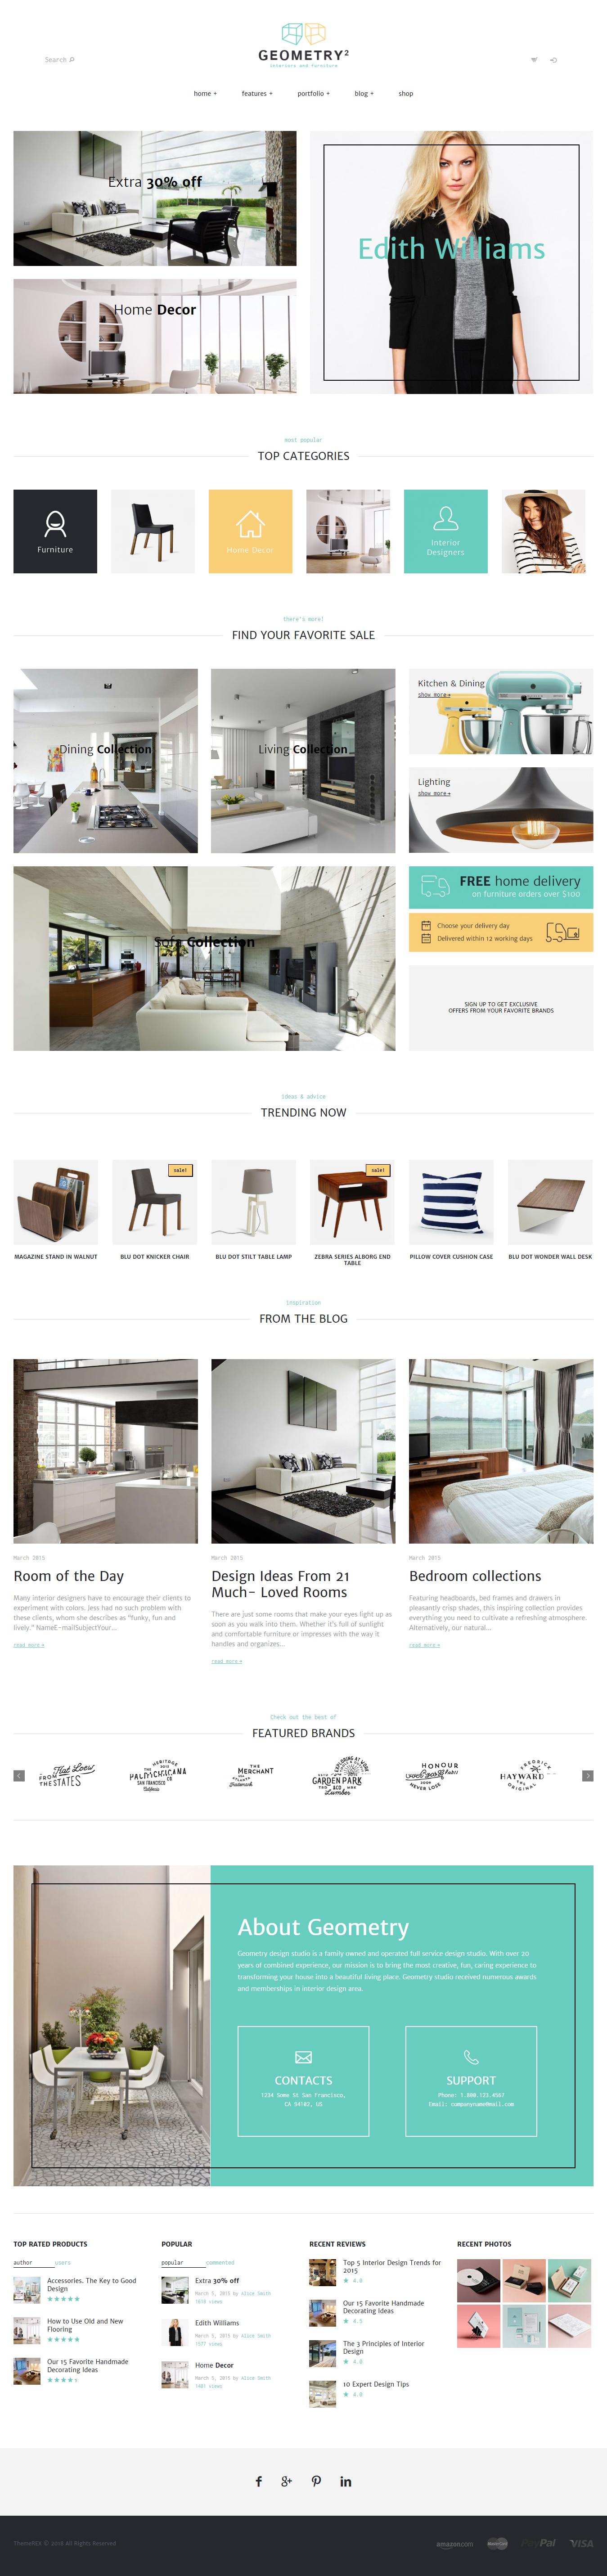 Geometry - Best Premium Interior Design WordPress Theme